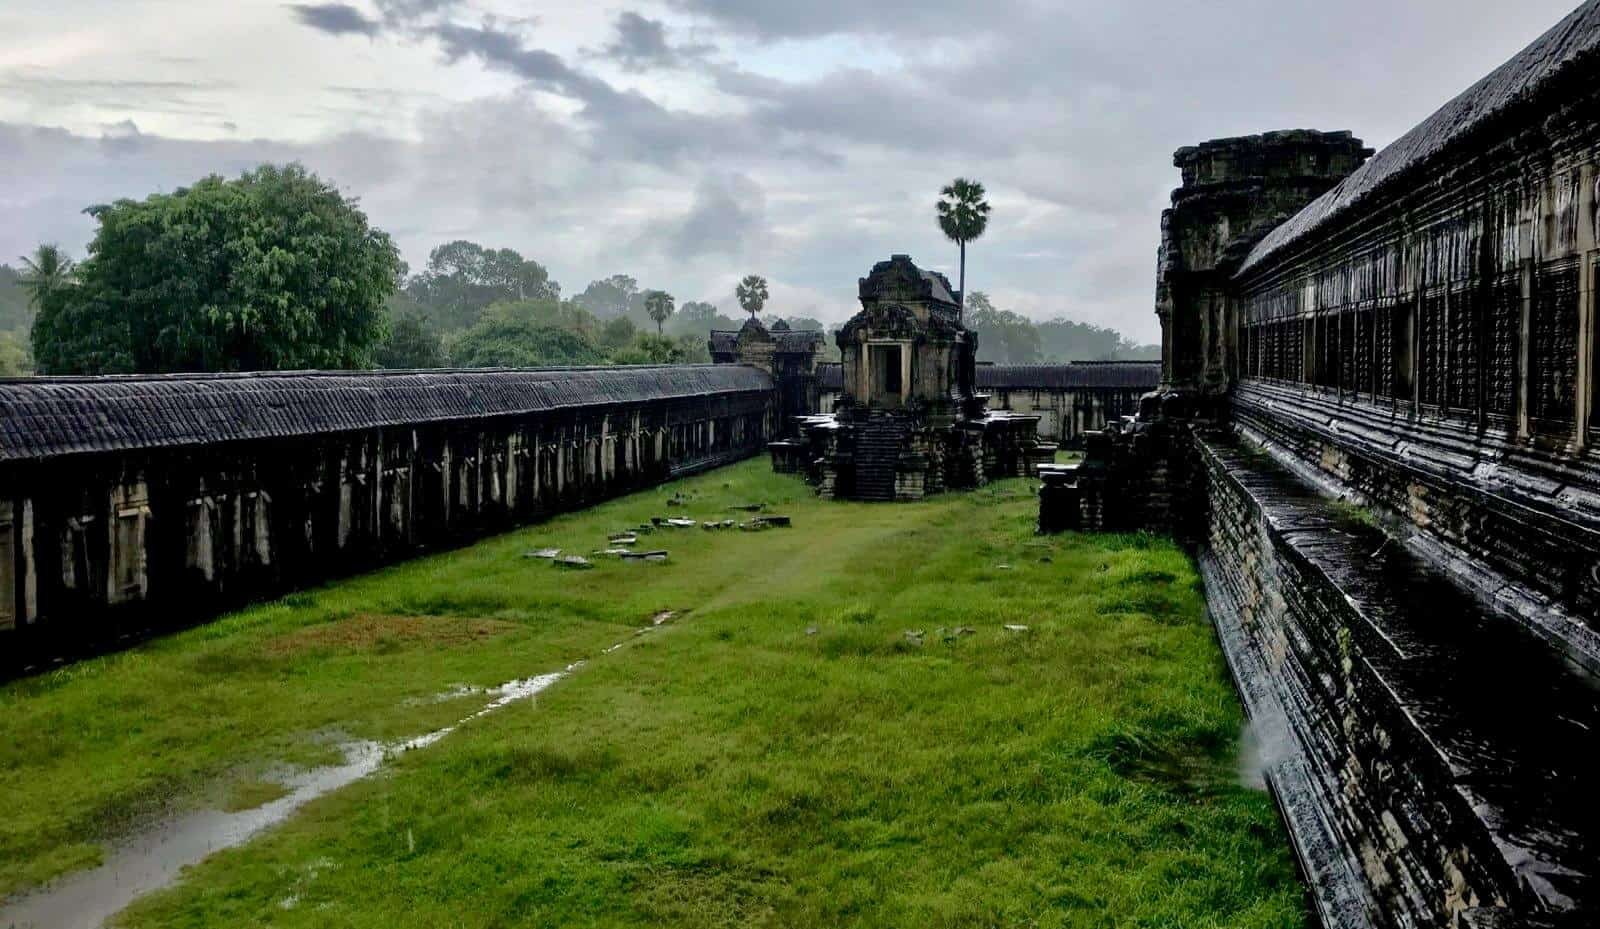 Siem Reap temples Cambodia betternotstop